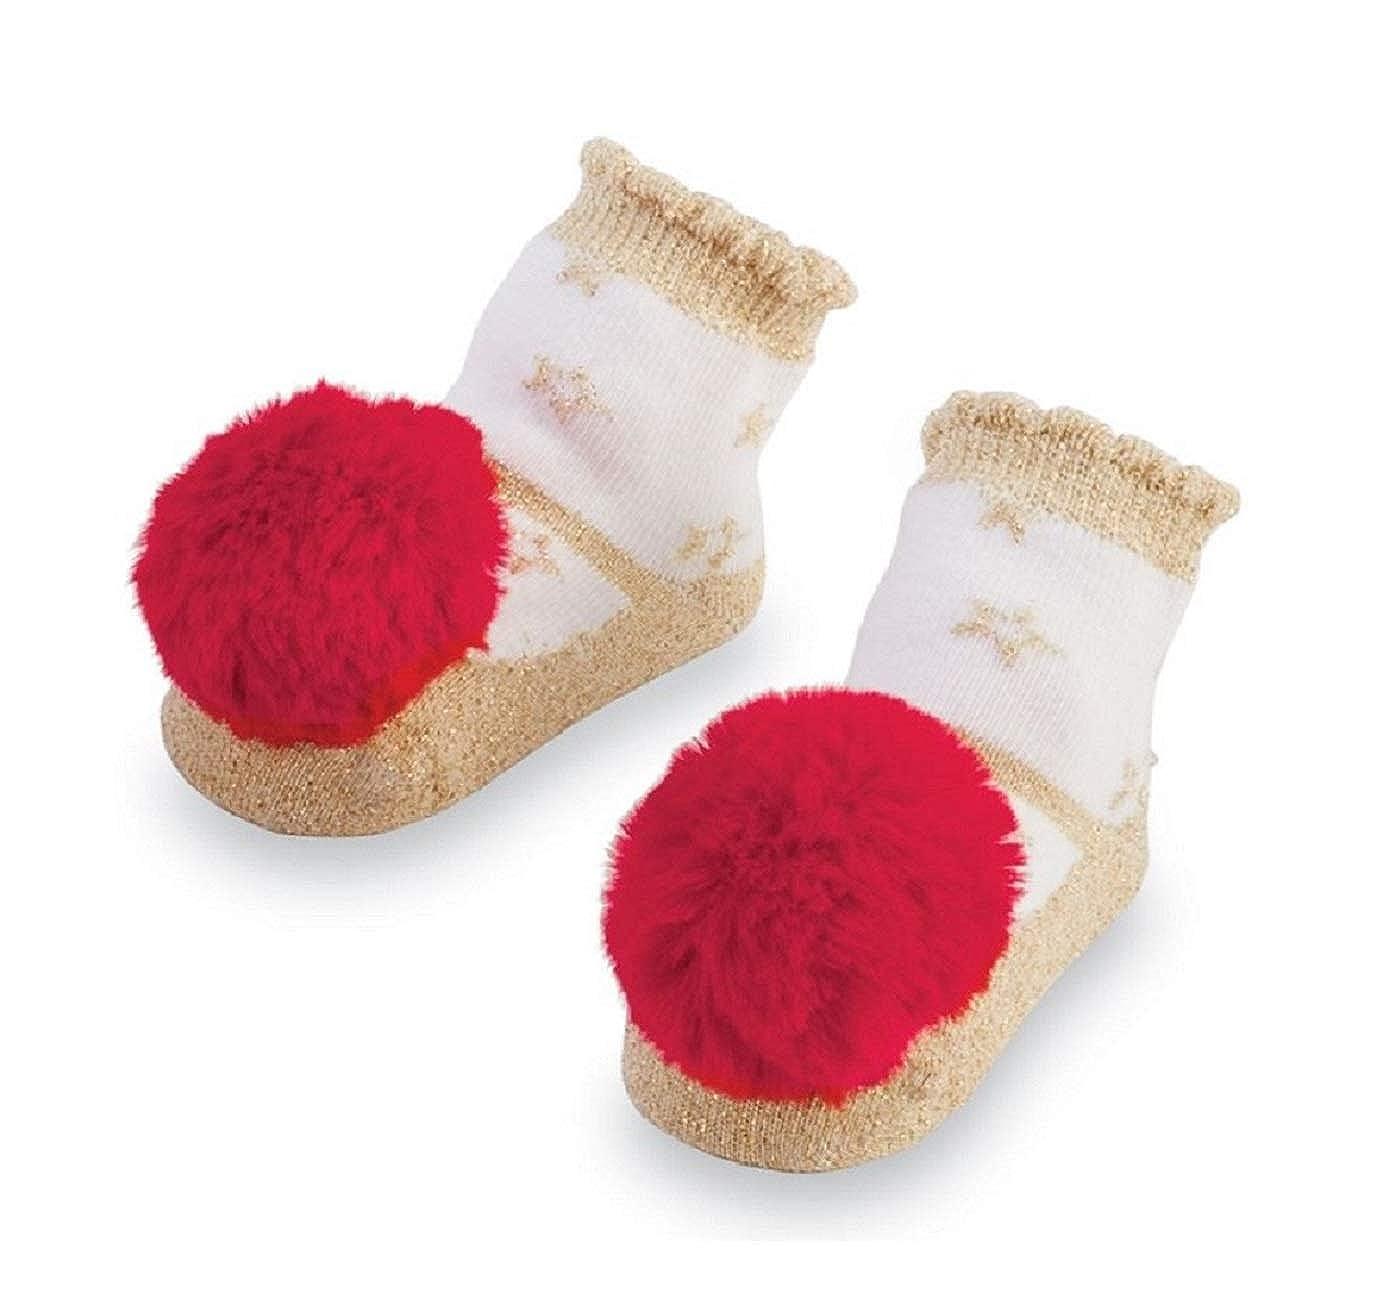 0-12 Months Mud Pie Glitter All The Way Red Pom Pom Rattle Toe Socks